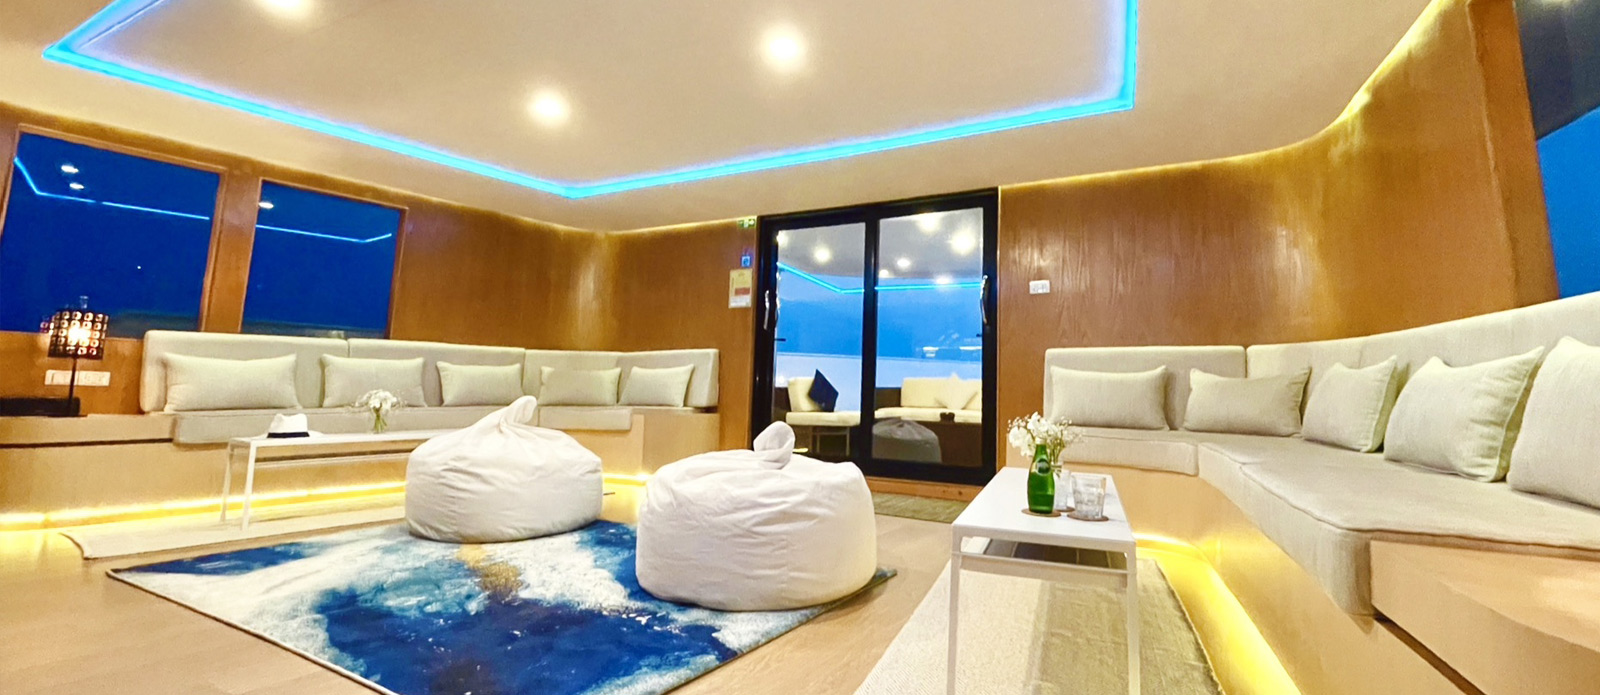 Safira-Luxury-Yacht-For-Sale-Interior-4